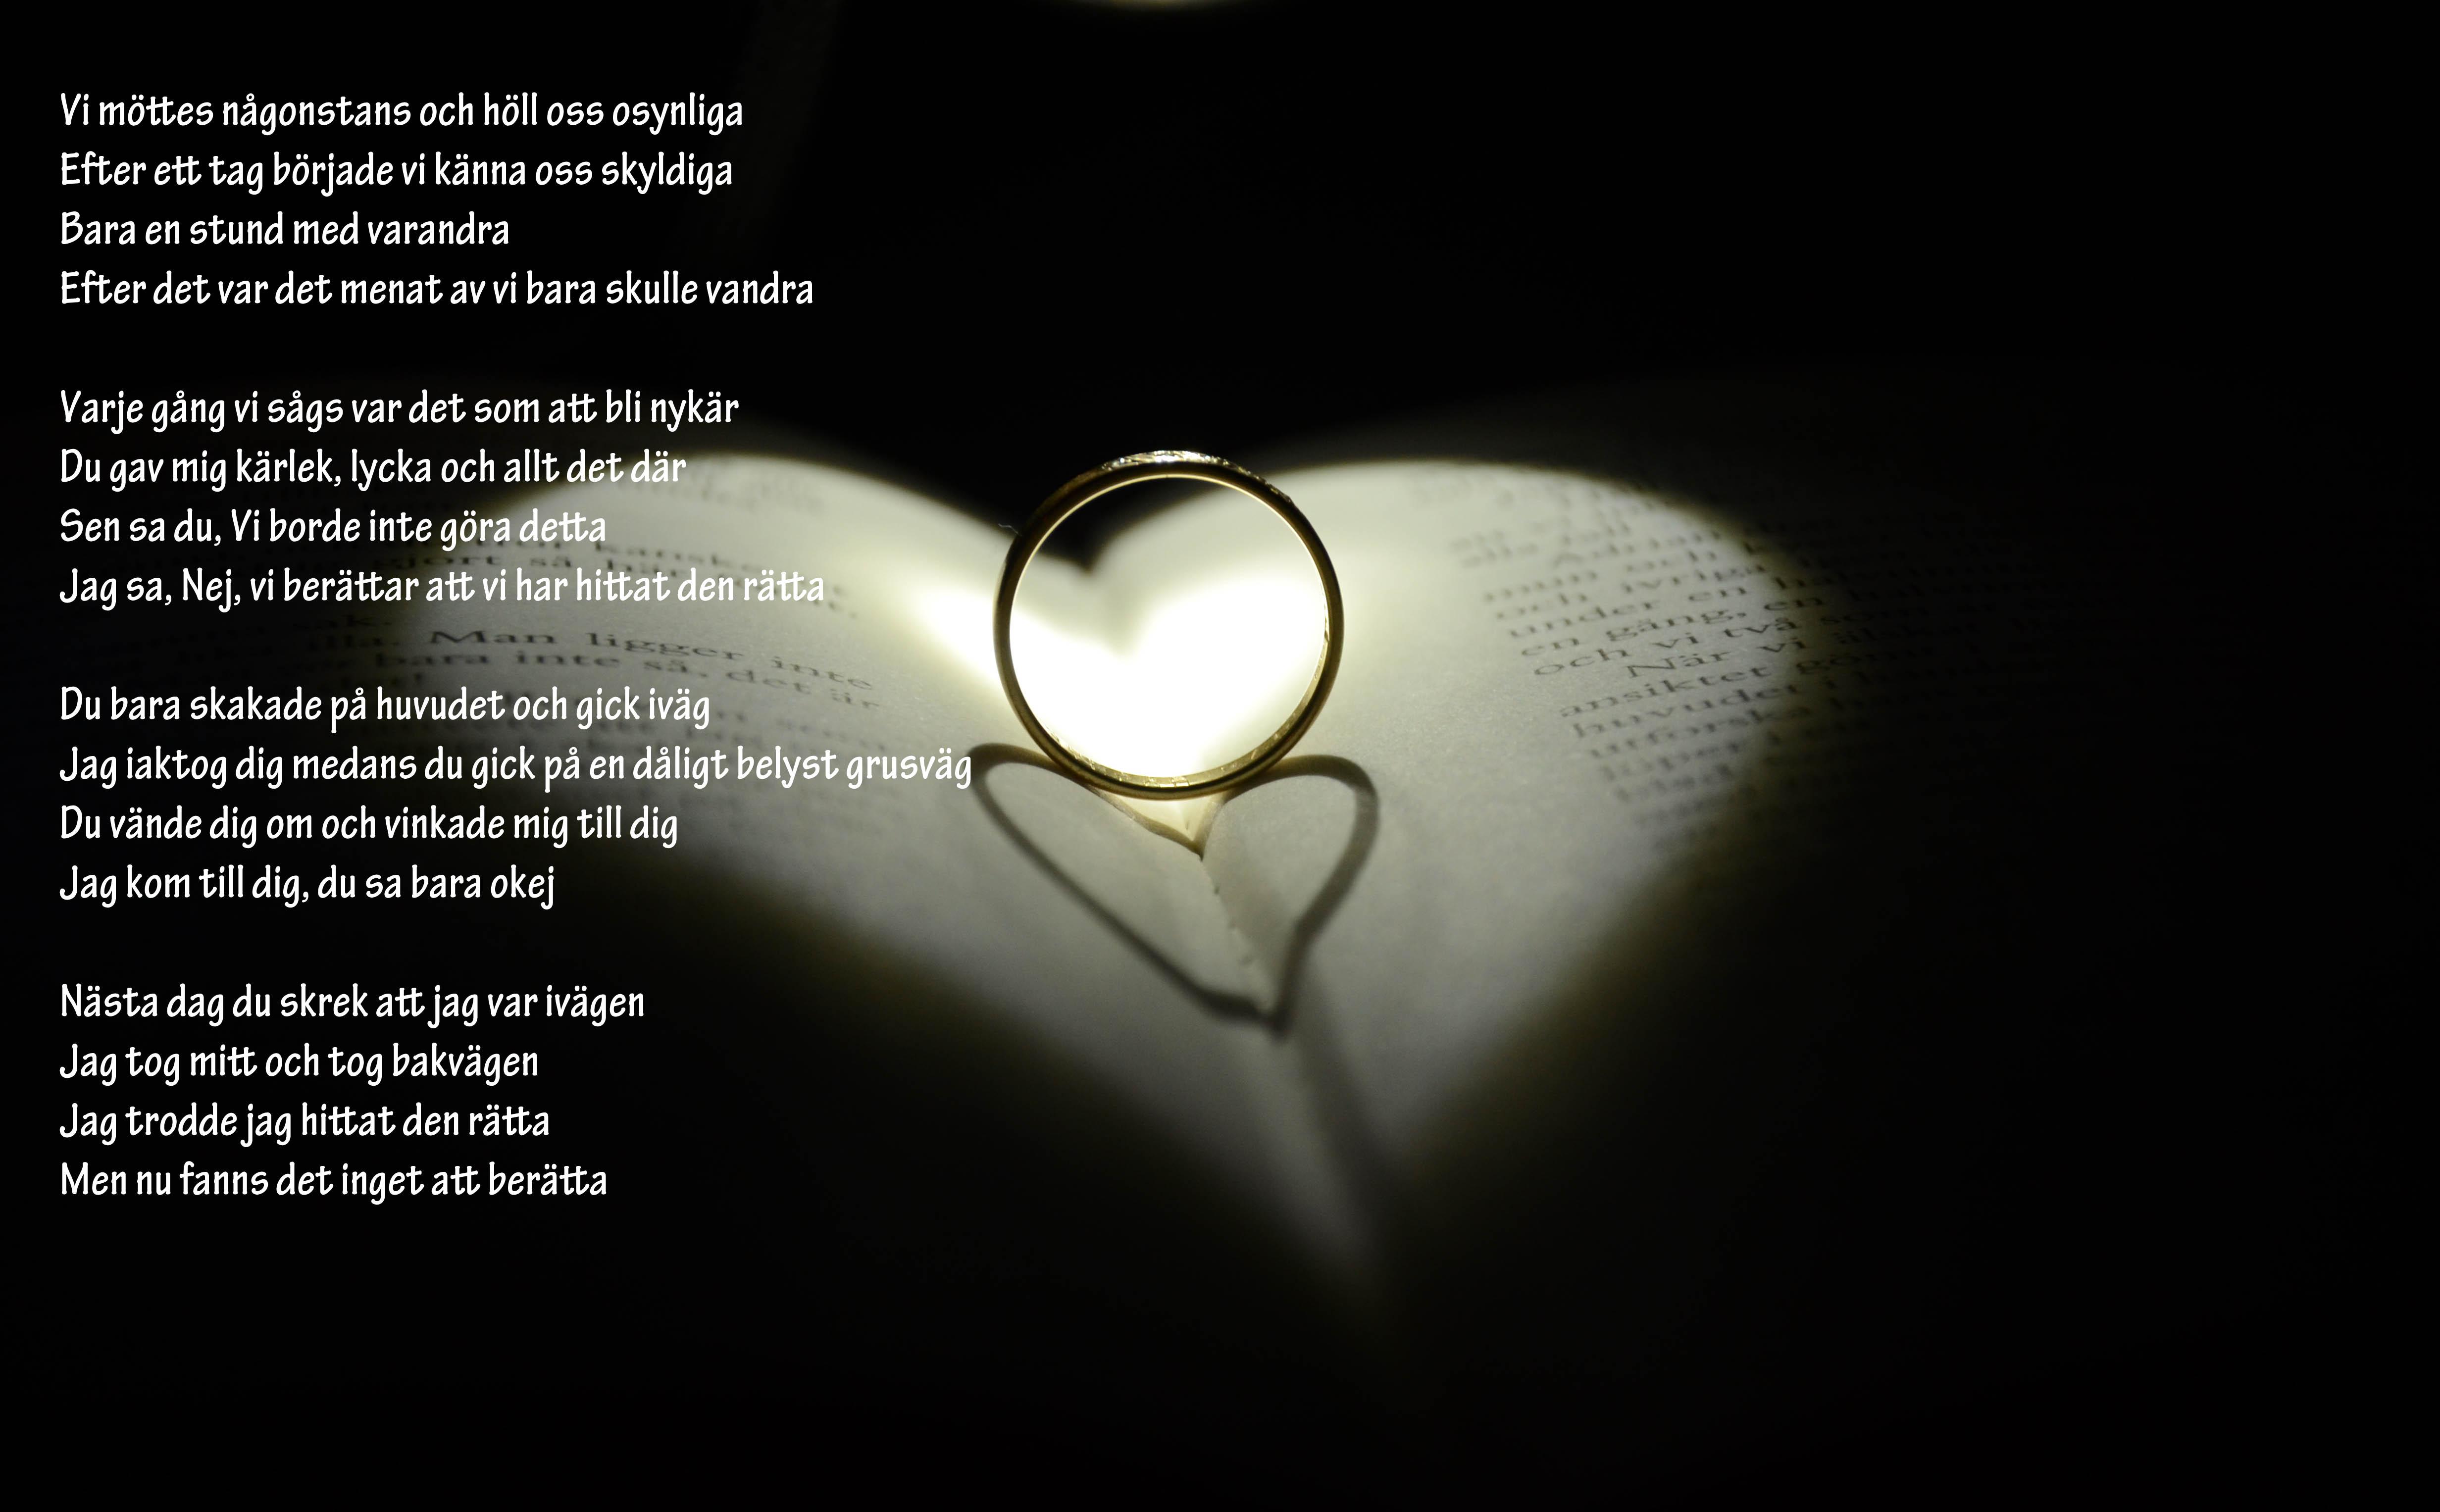 älska mig dikt